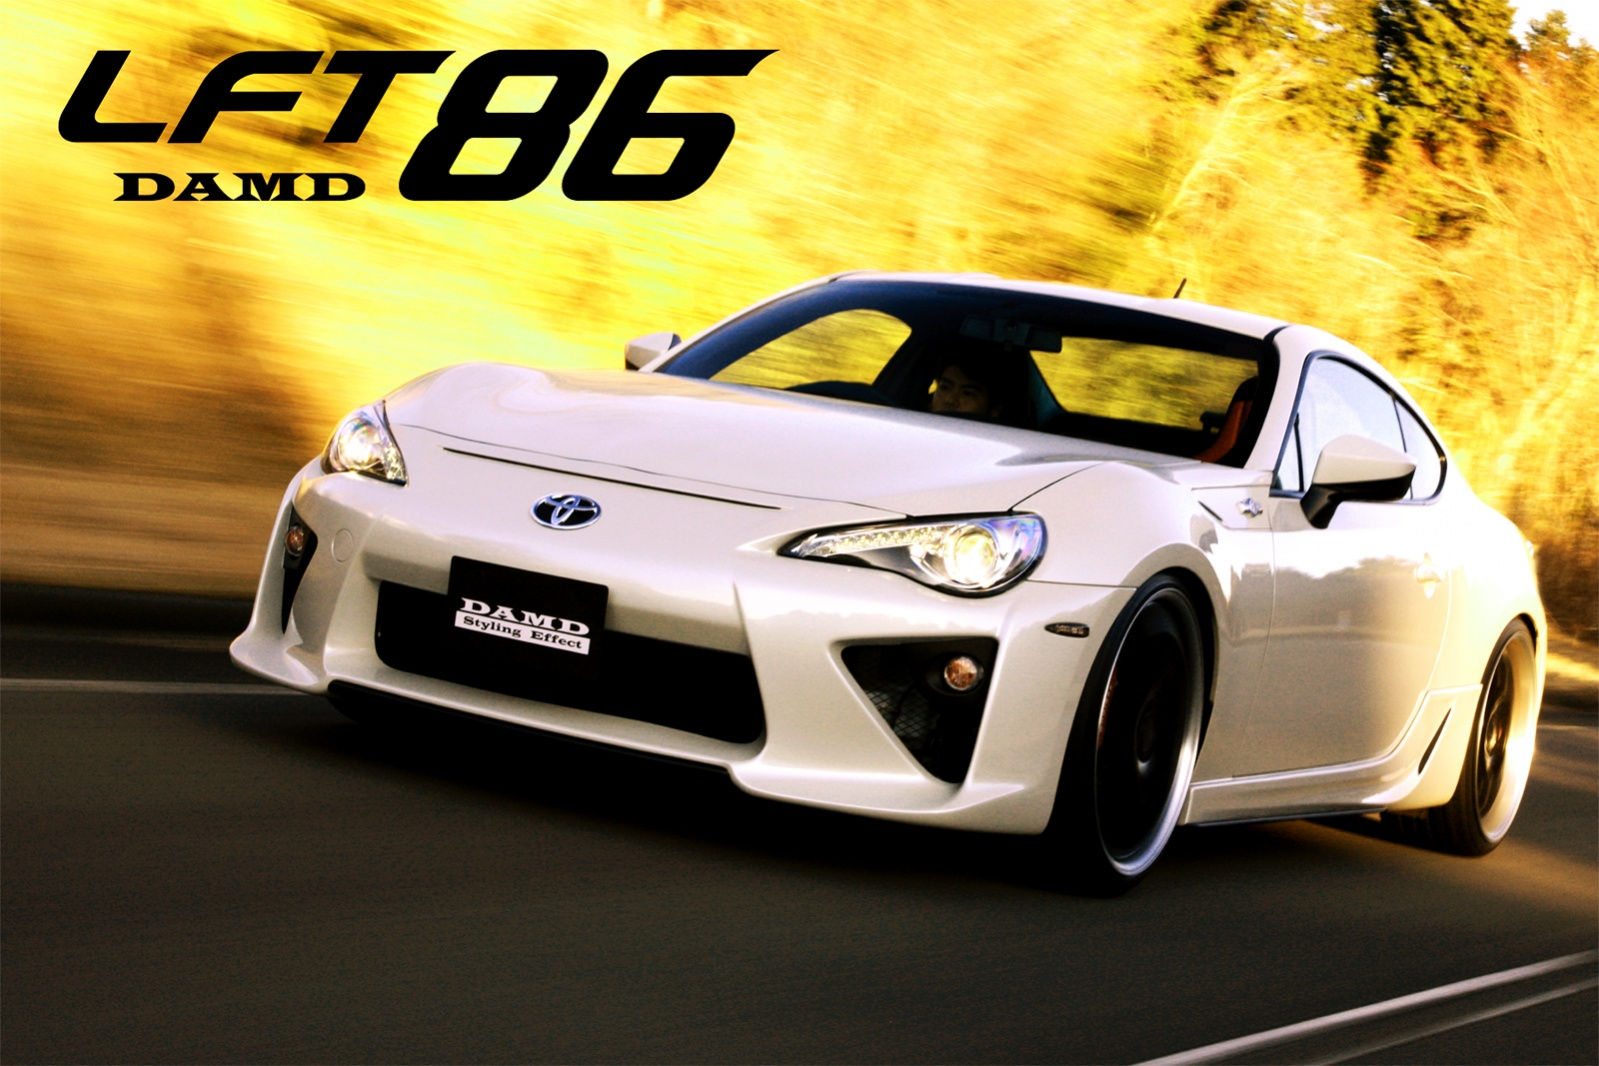 S0-Insolite-une-Toyota-GT86-qui-se-prend-pour-une-LFA-284017.jpg